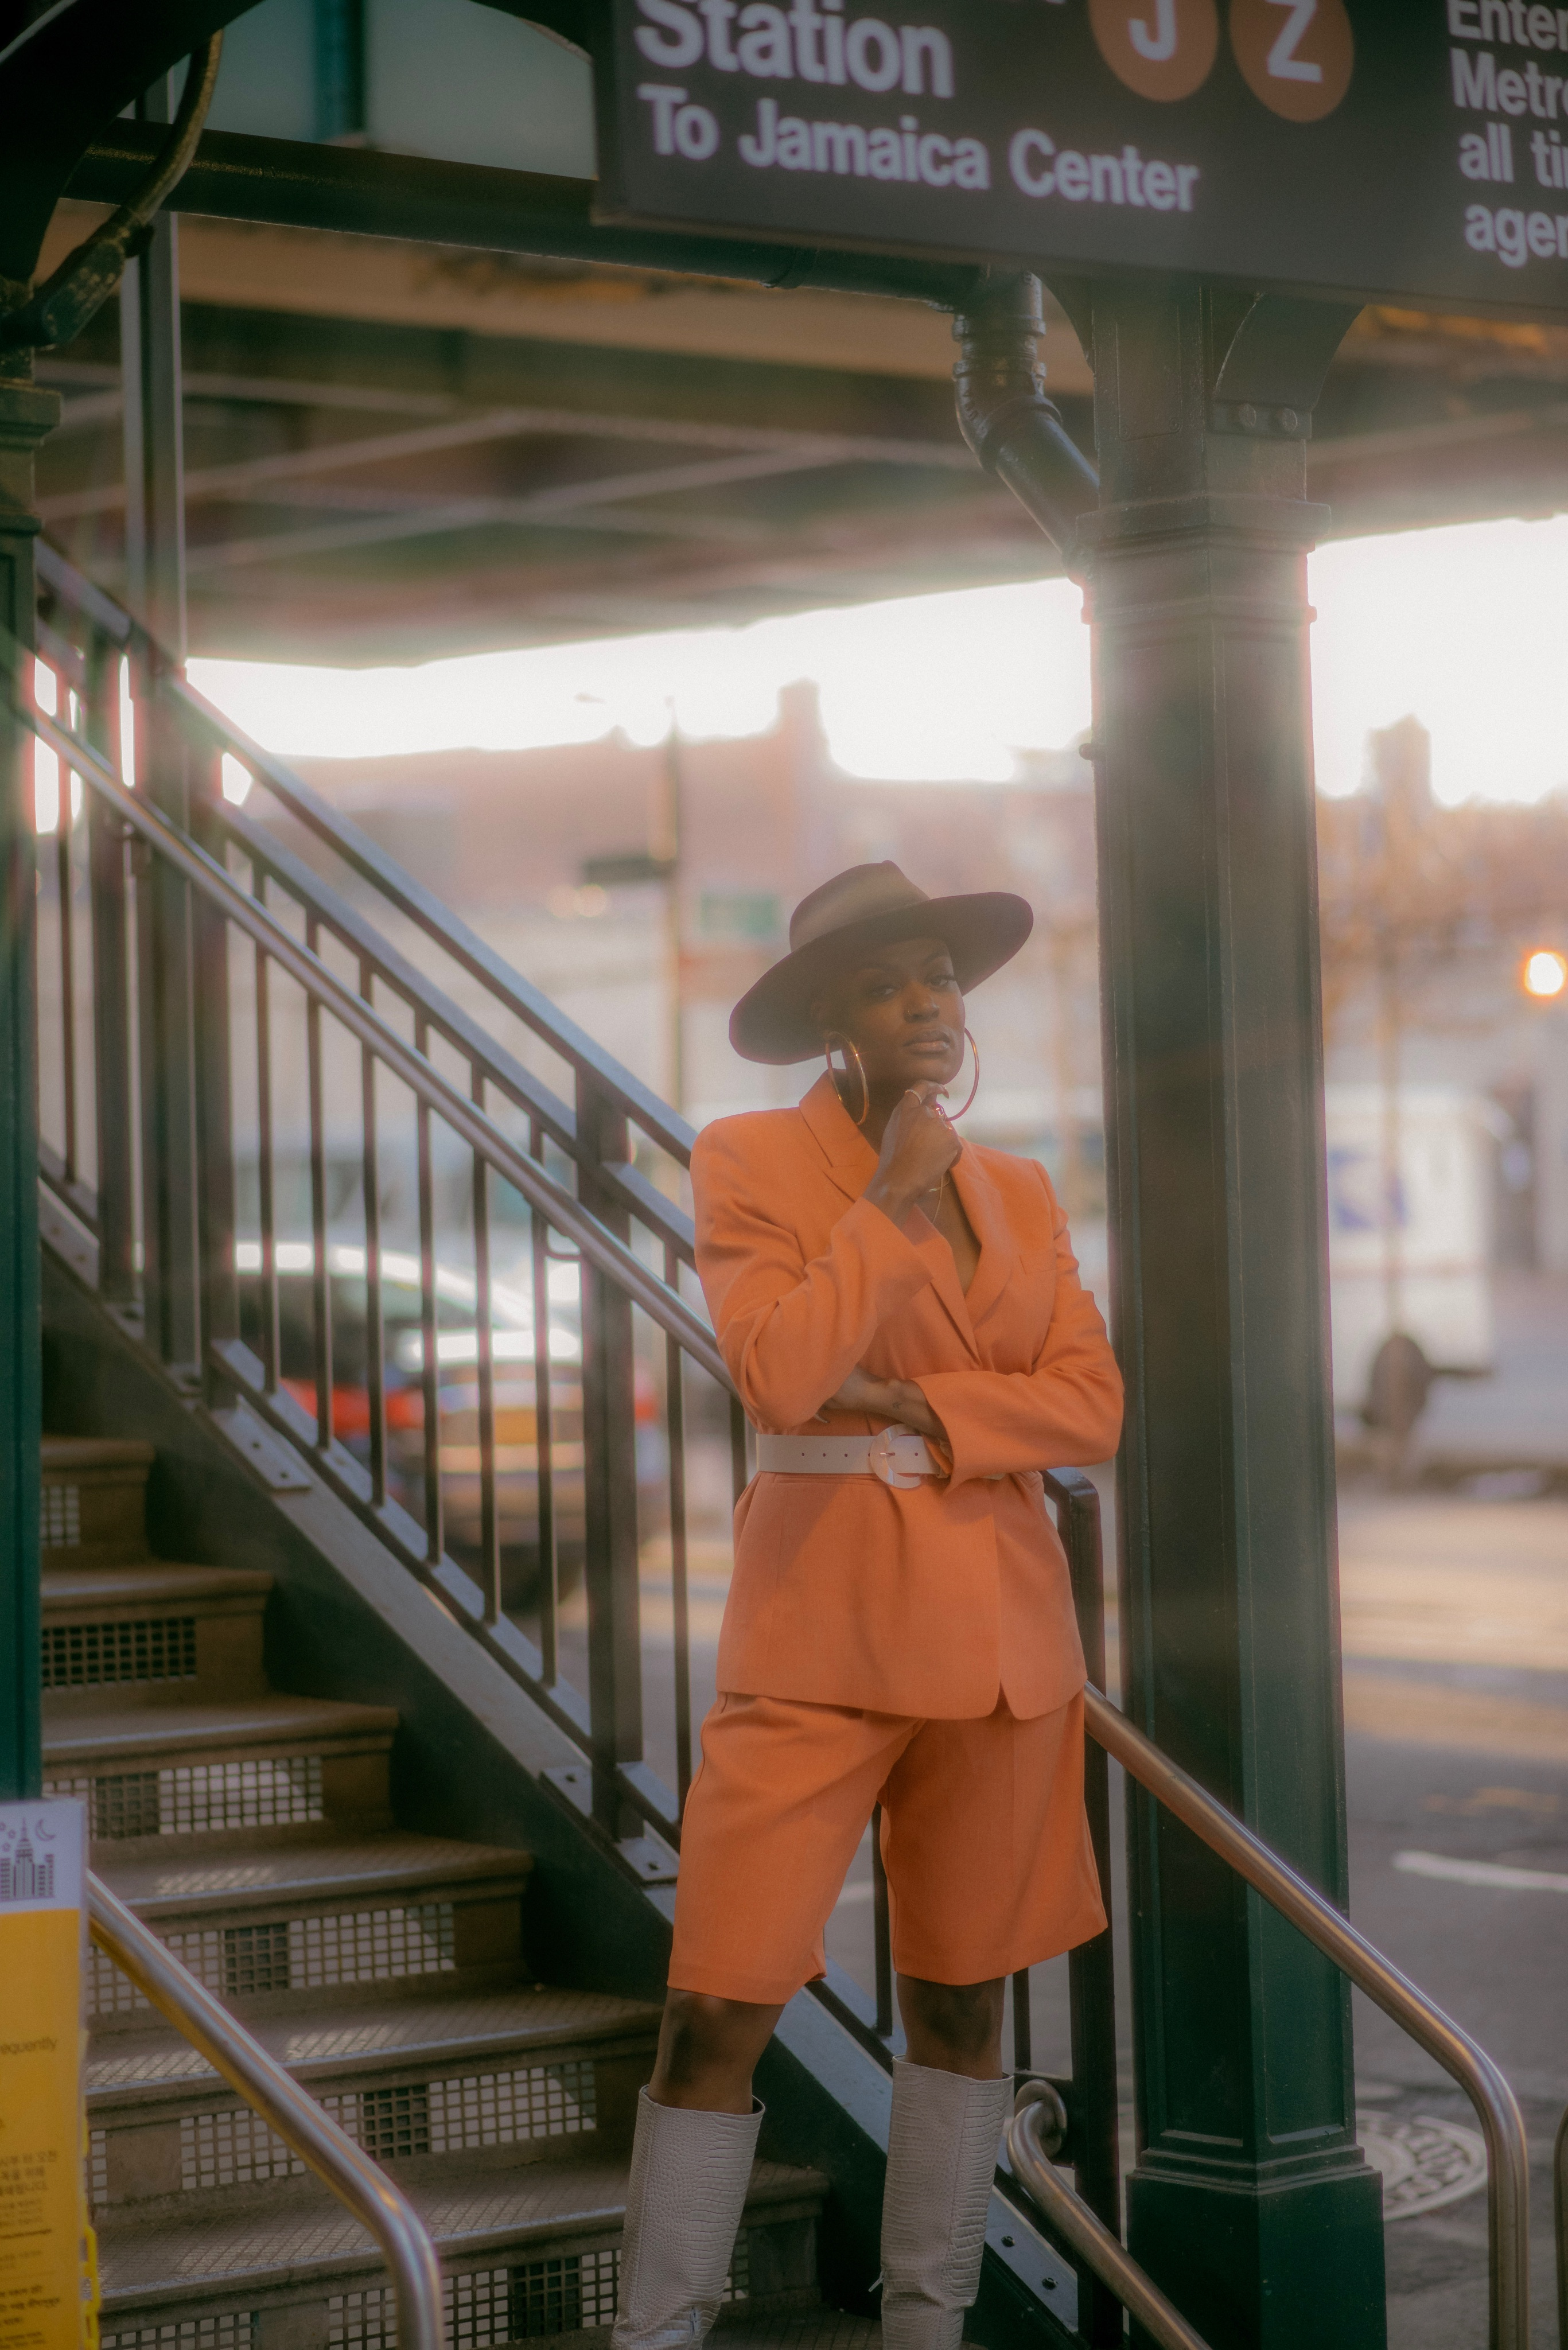 The Subway: Infinite Possibilities